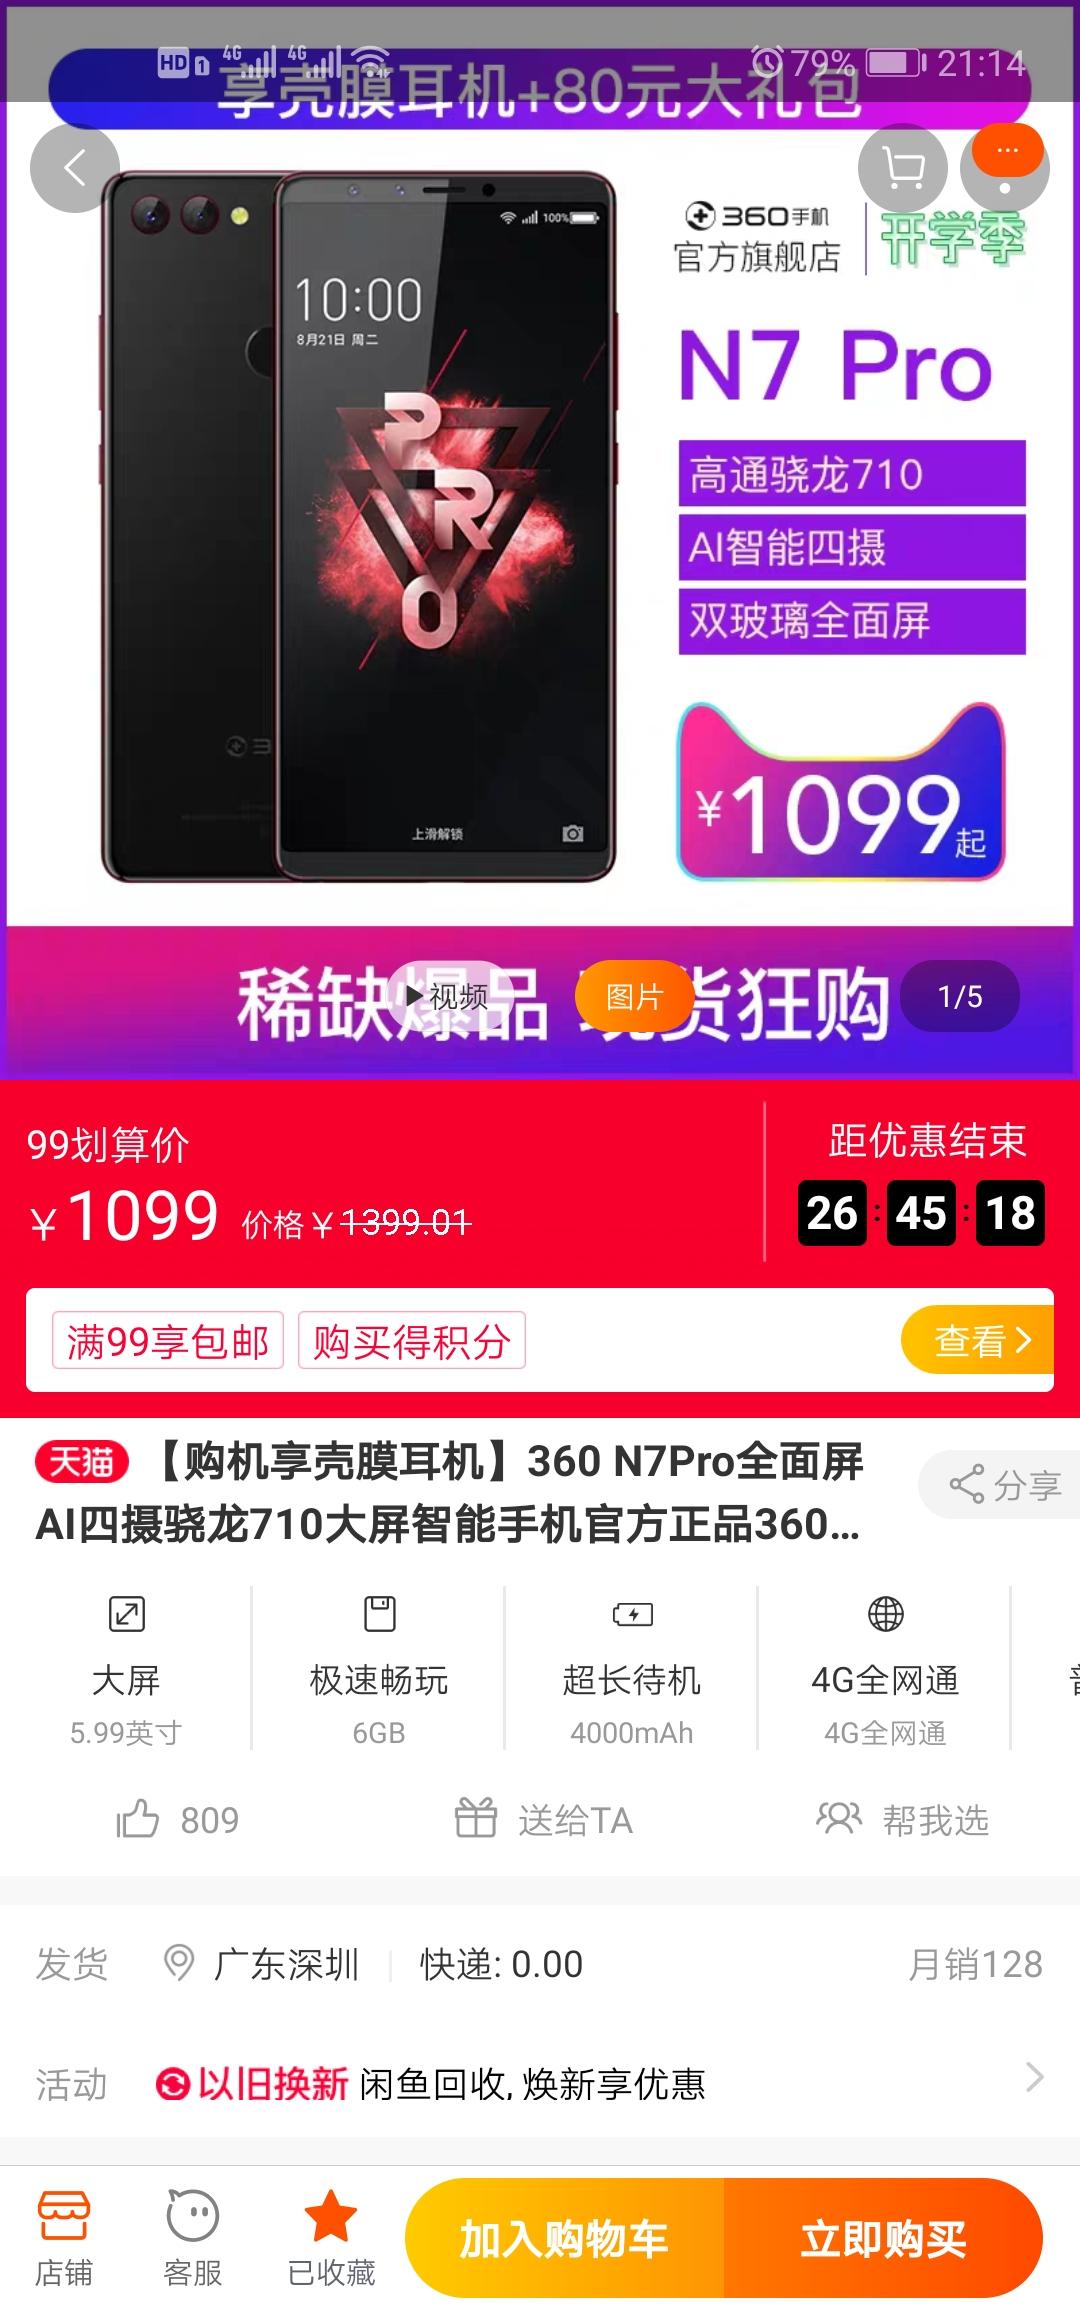 Screenshot_20190909_211440_com.taobao.taobao.jpg